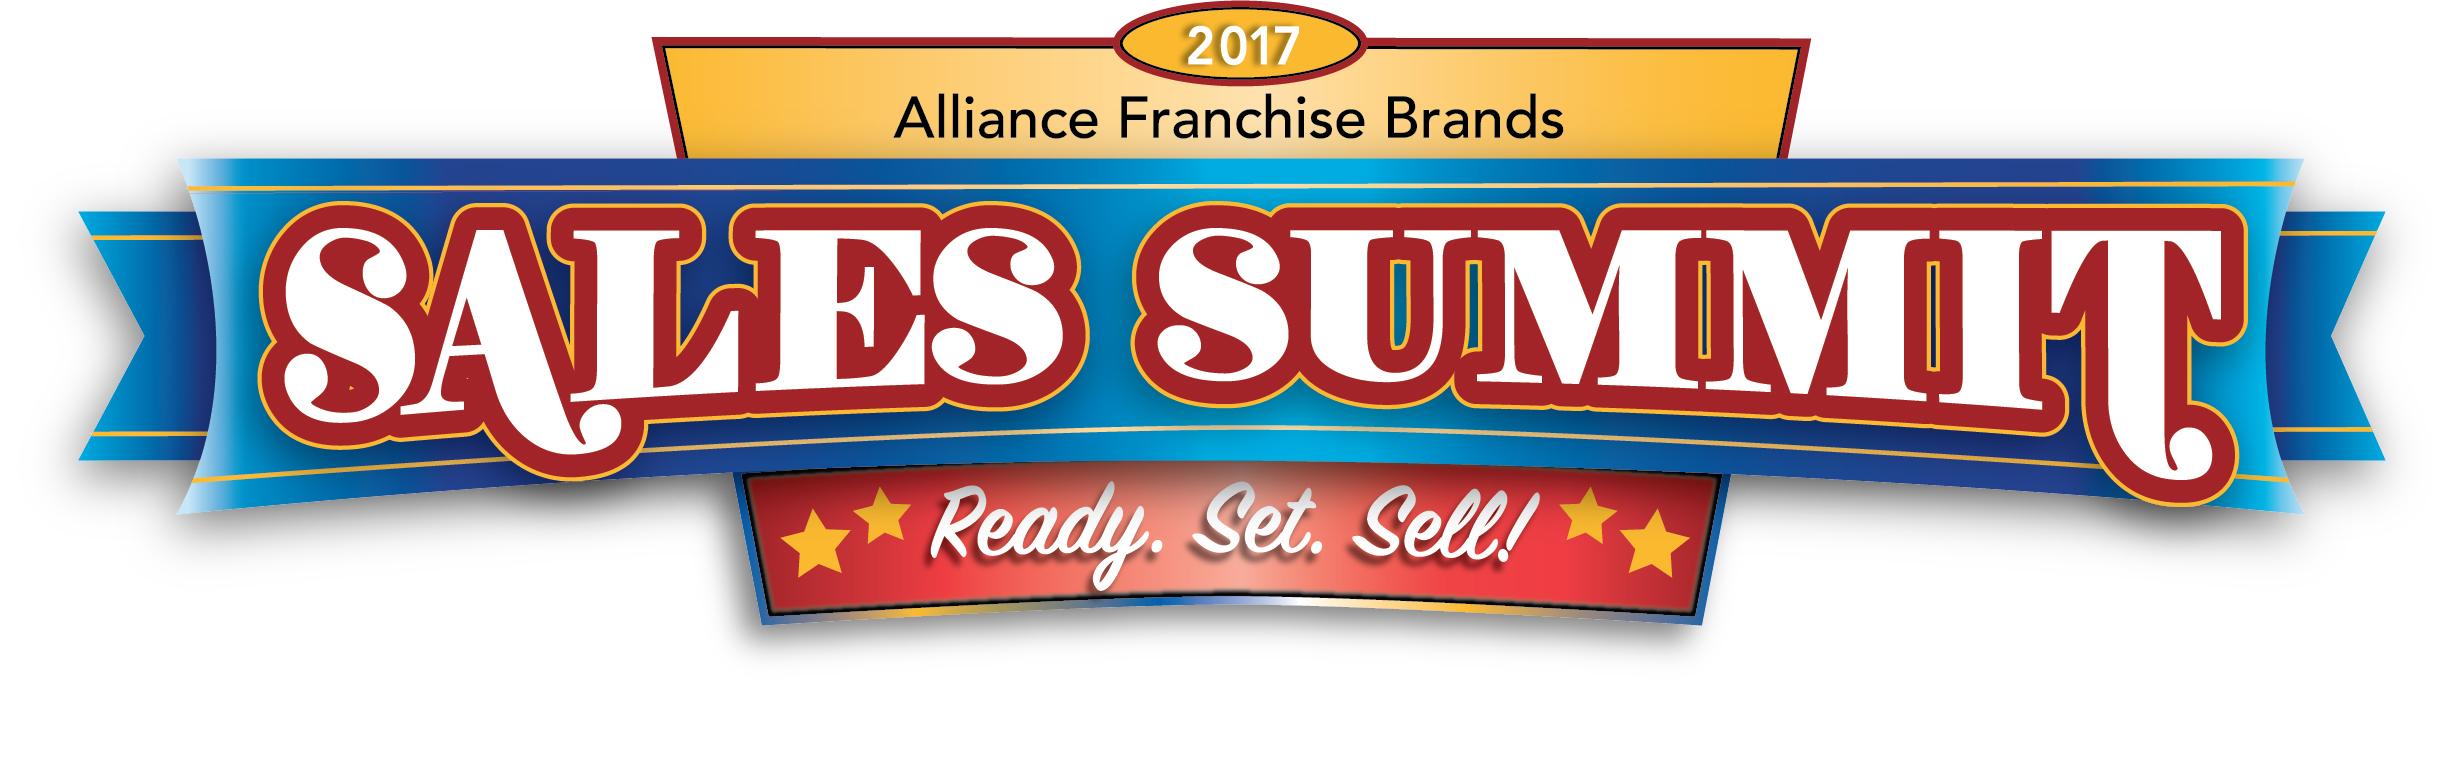 2017 Sales Summit: Ready. Set. Sell!